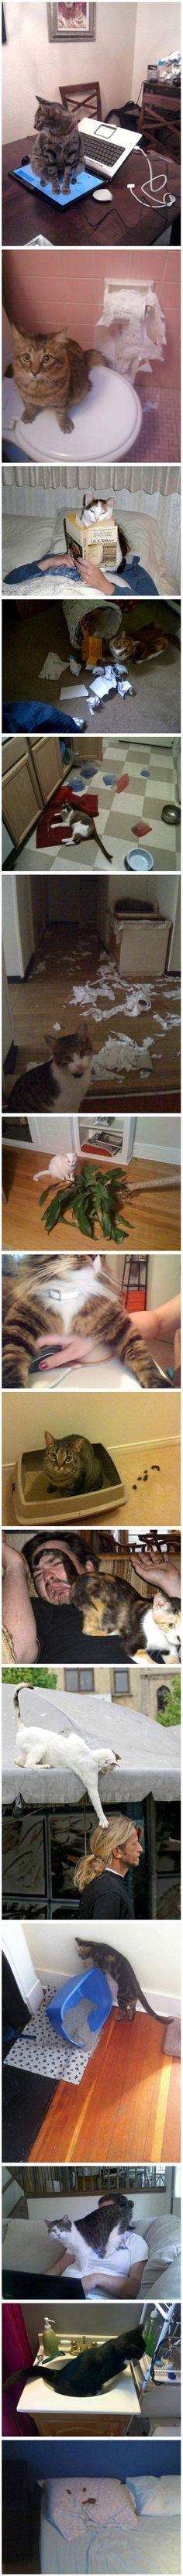 CAT rebellion ꉂ꒰⑉˃ꈊ˂⑉꒱⍝